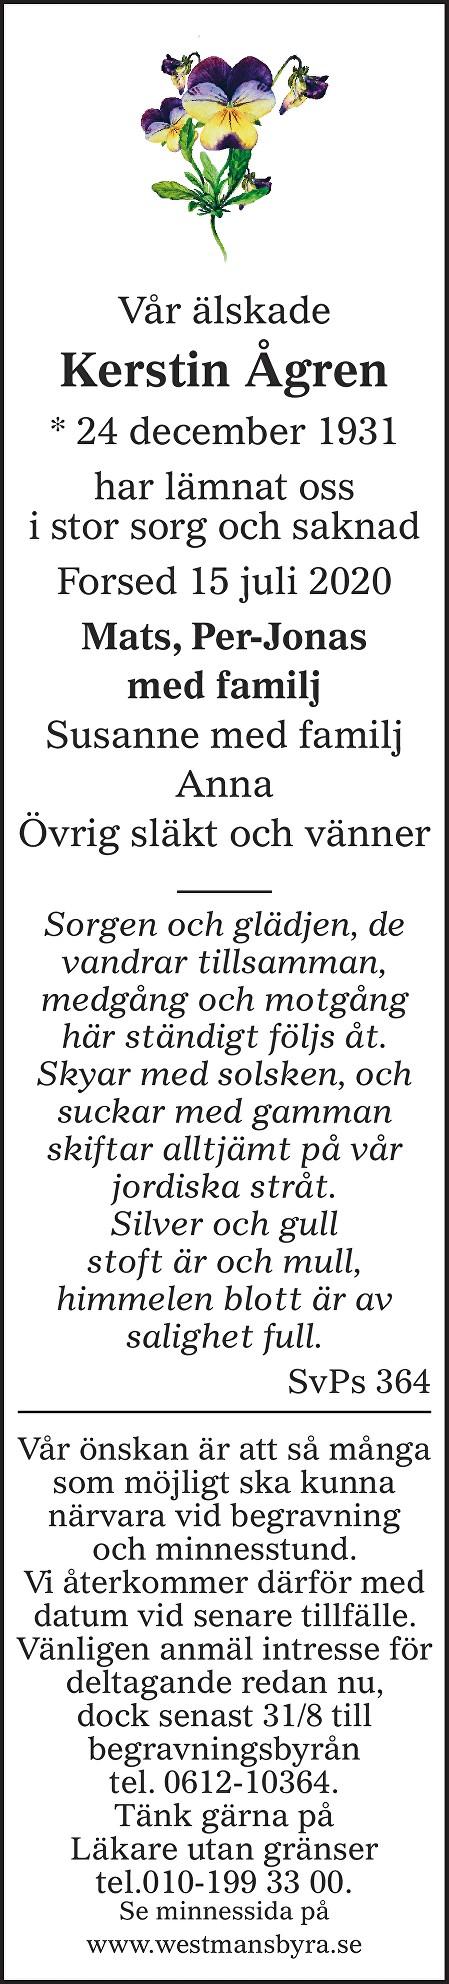 Kerstin Ågren Death notice